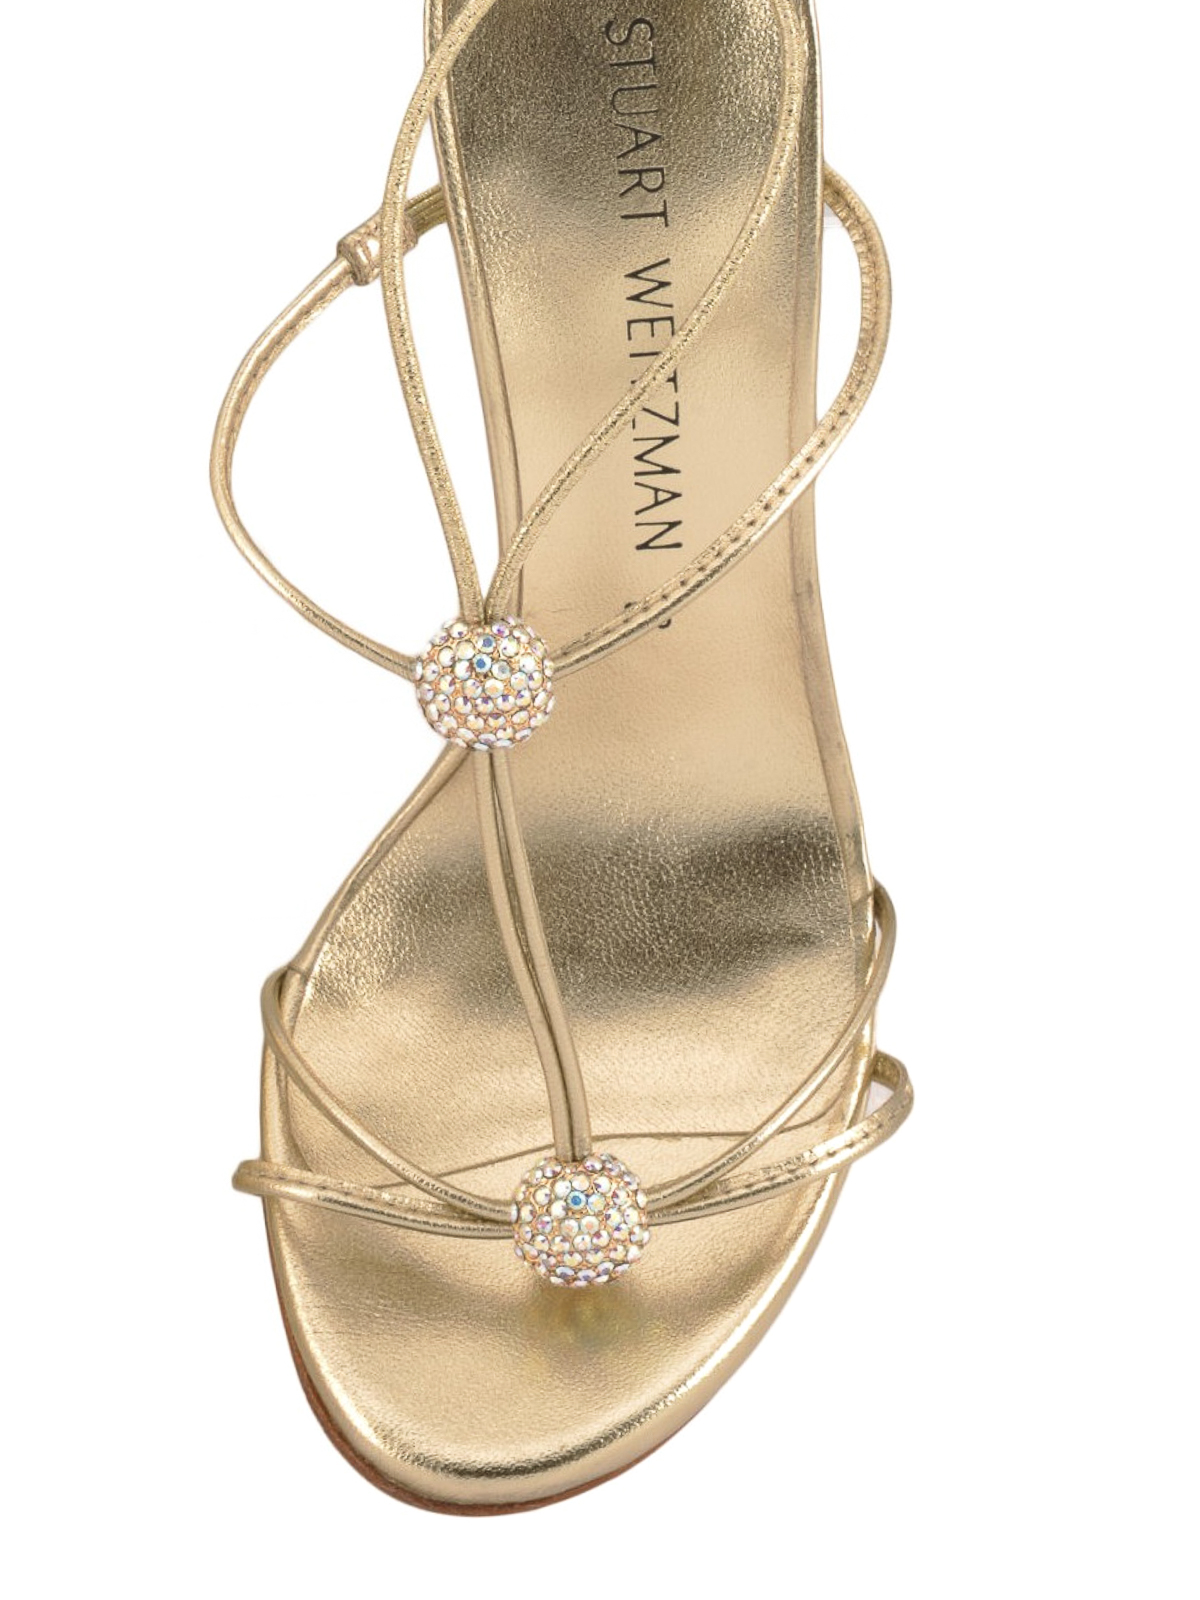 8de78249889ce iKRIX Stuart Weitzman  sandals - Trixie embellished leather sandals